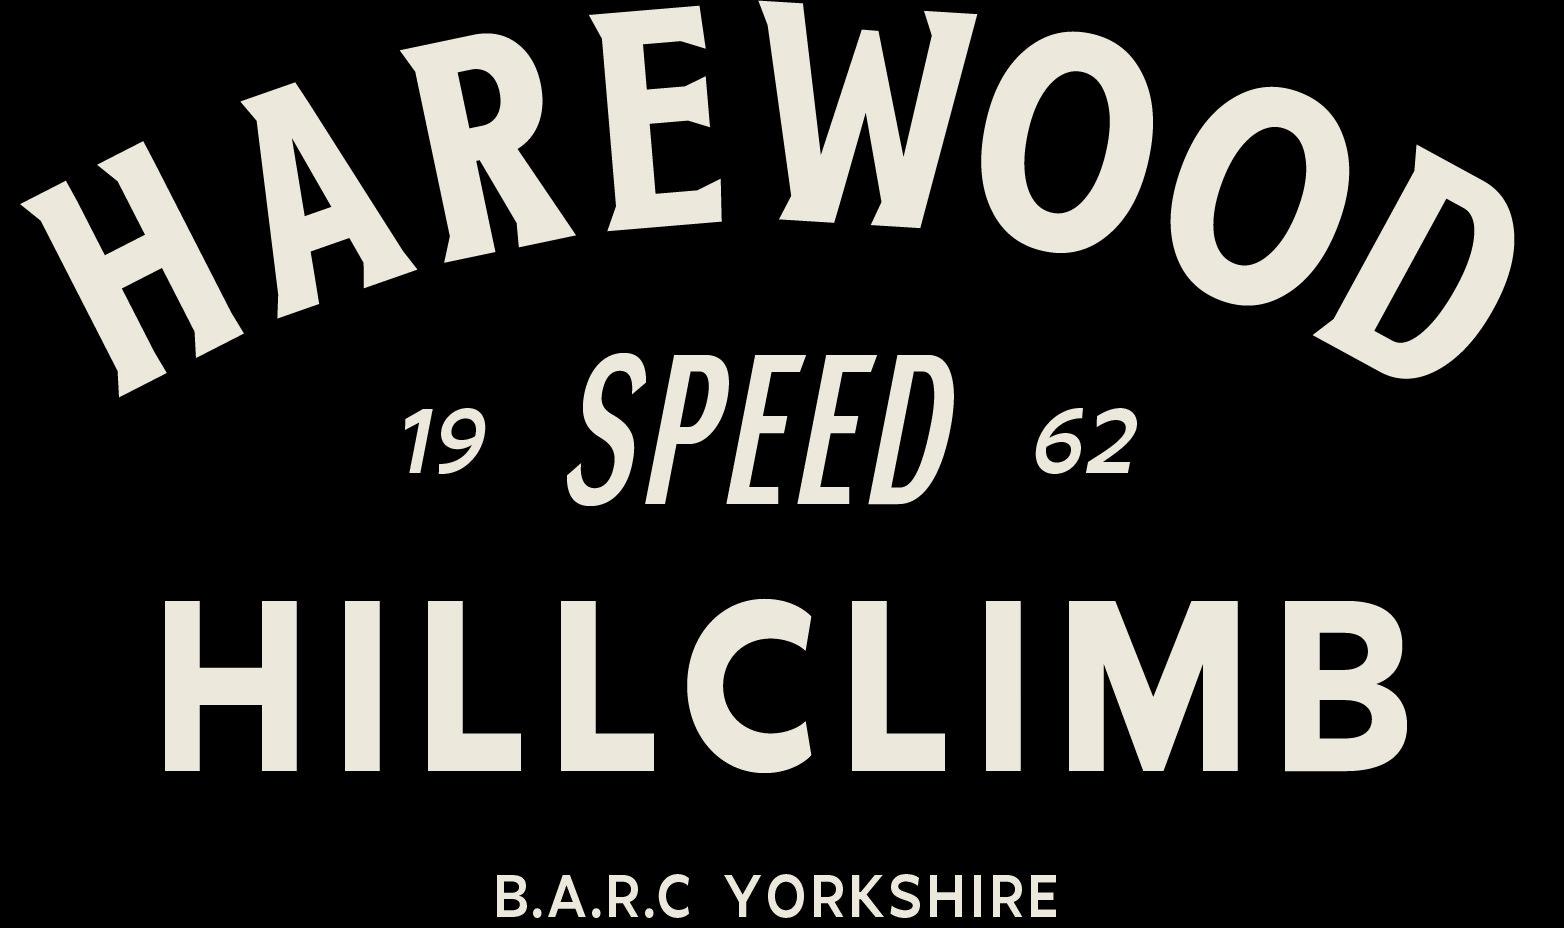 harewood hillclimb typographic logo